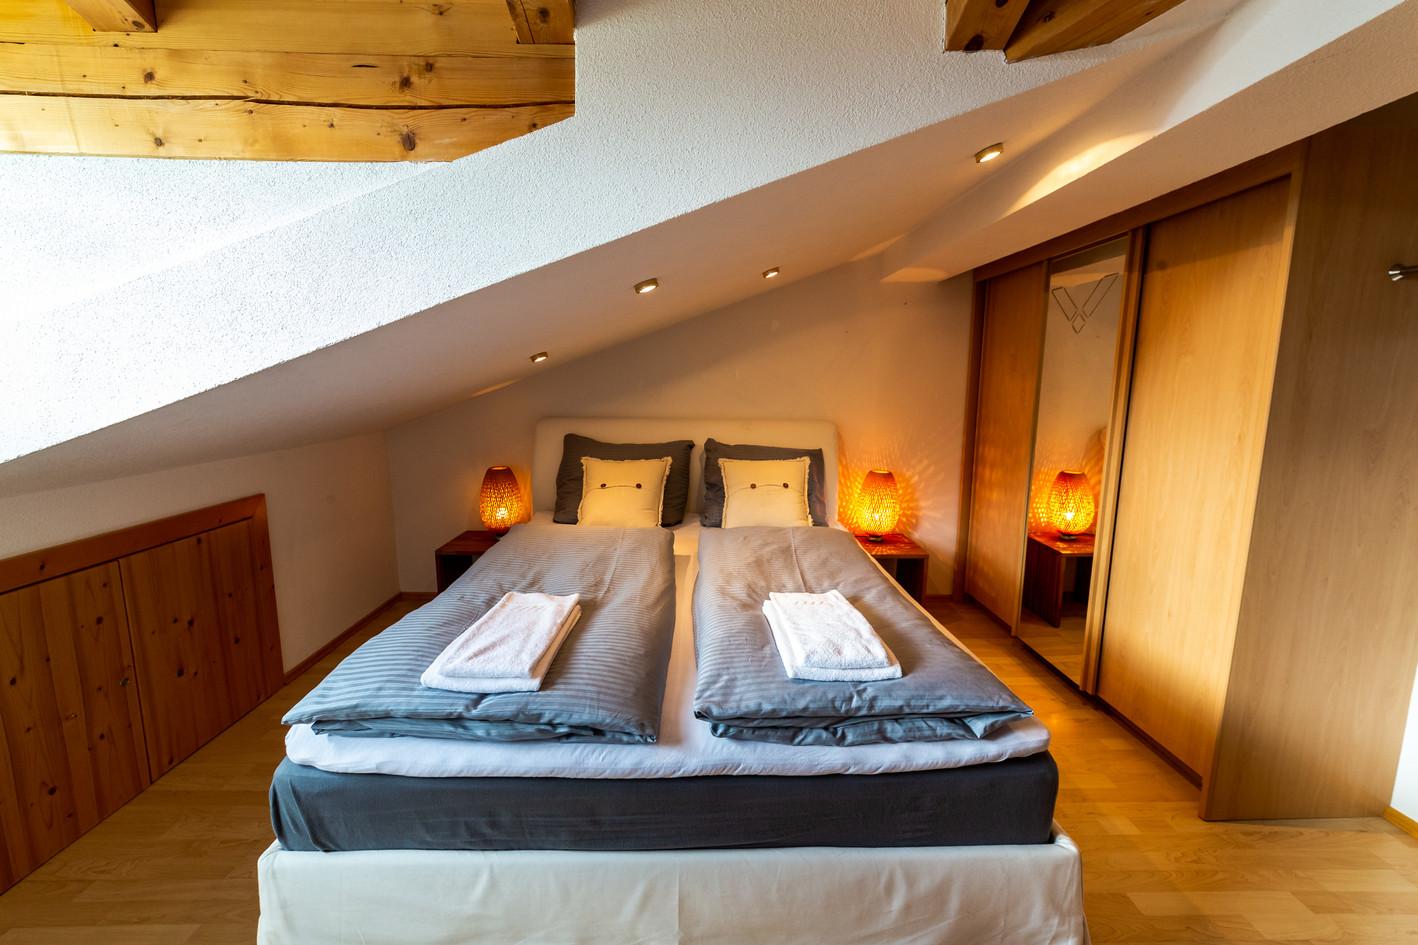 schneehaus chalet weiberhimmel bedroom 1